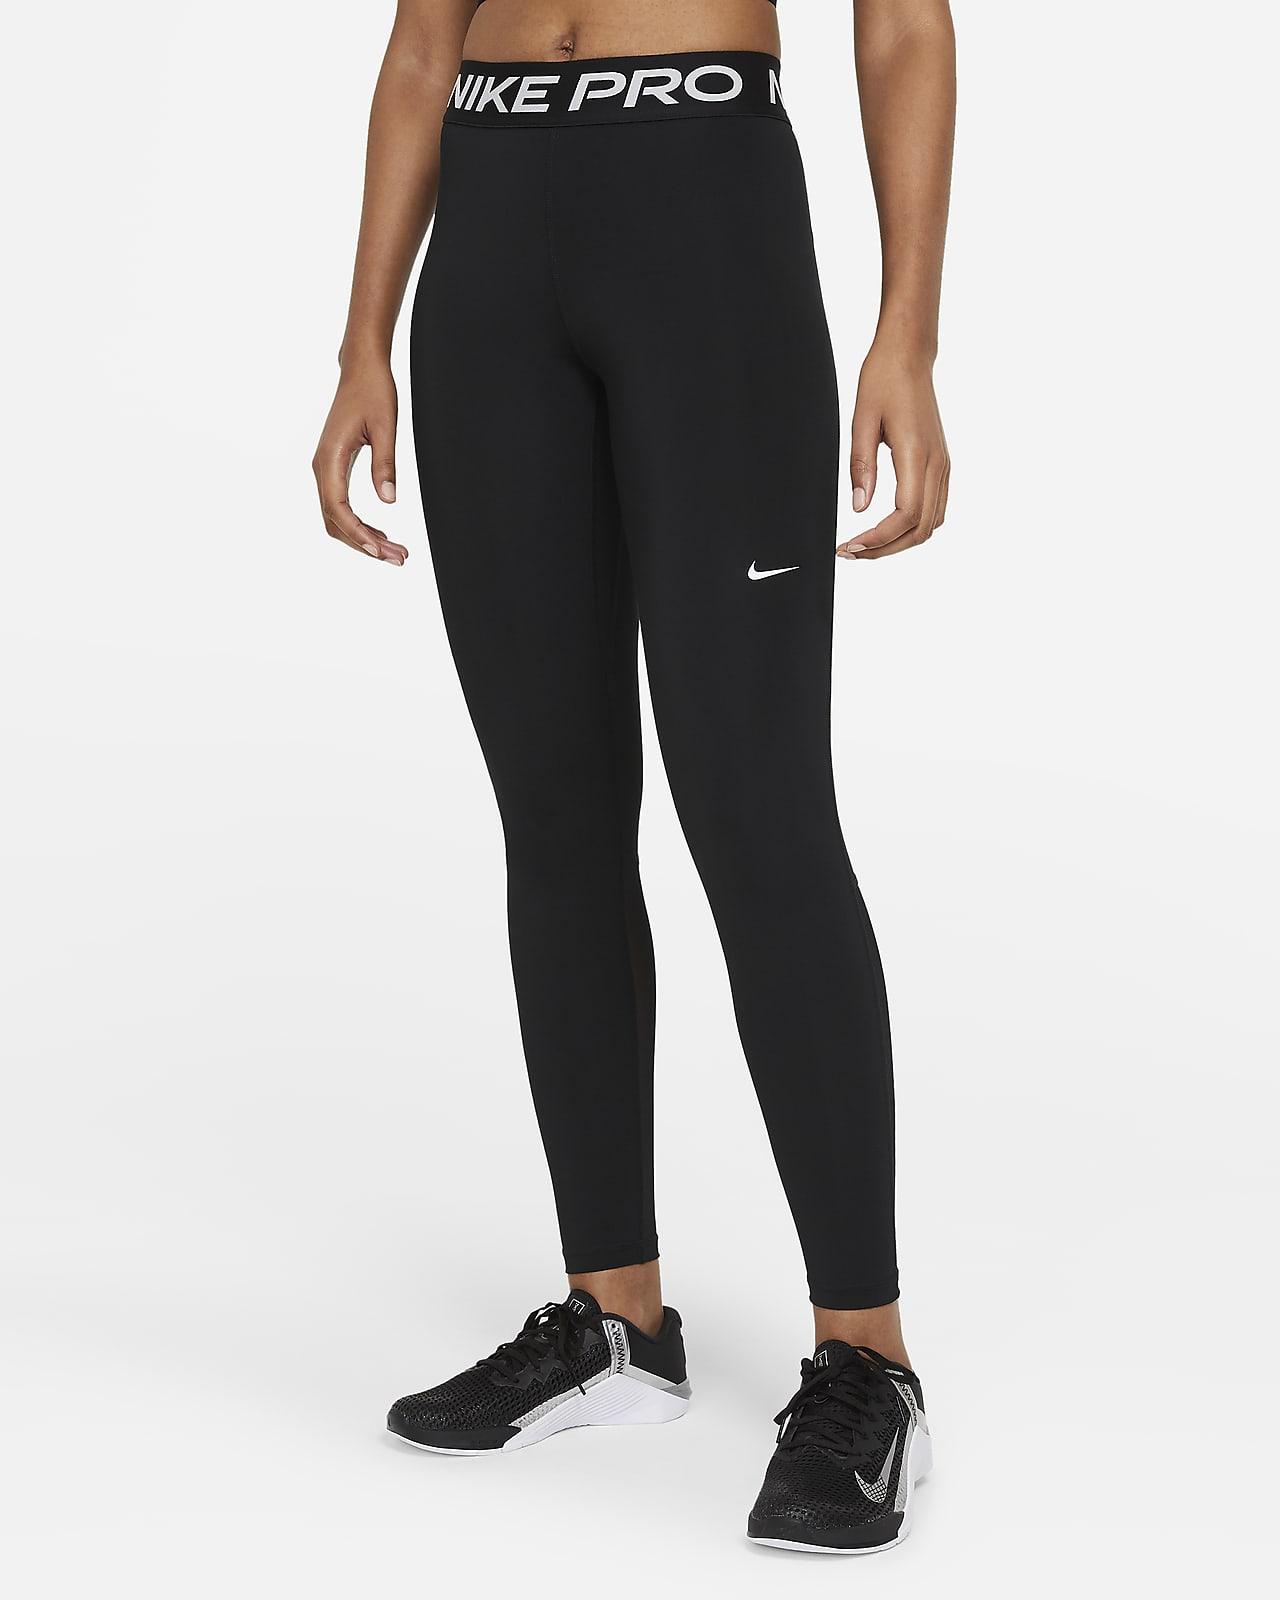 Legging taille mi-haute Nike Pro pour Femme